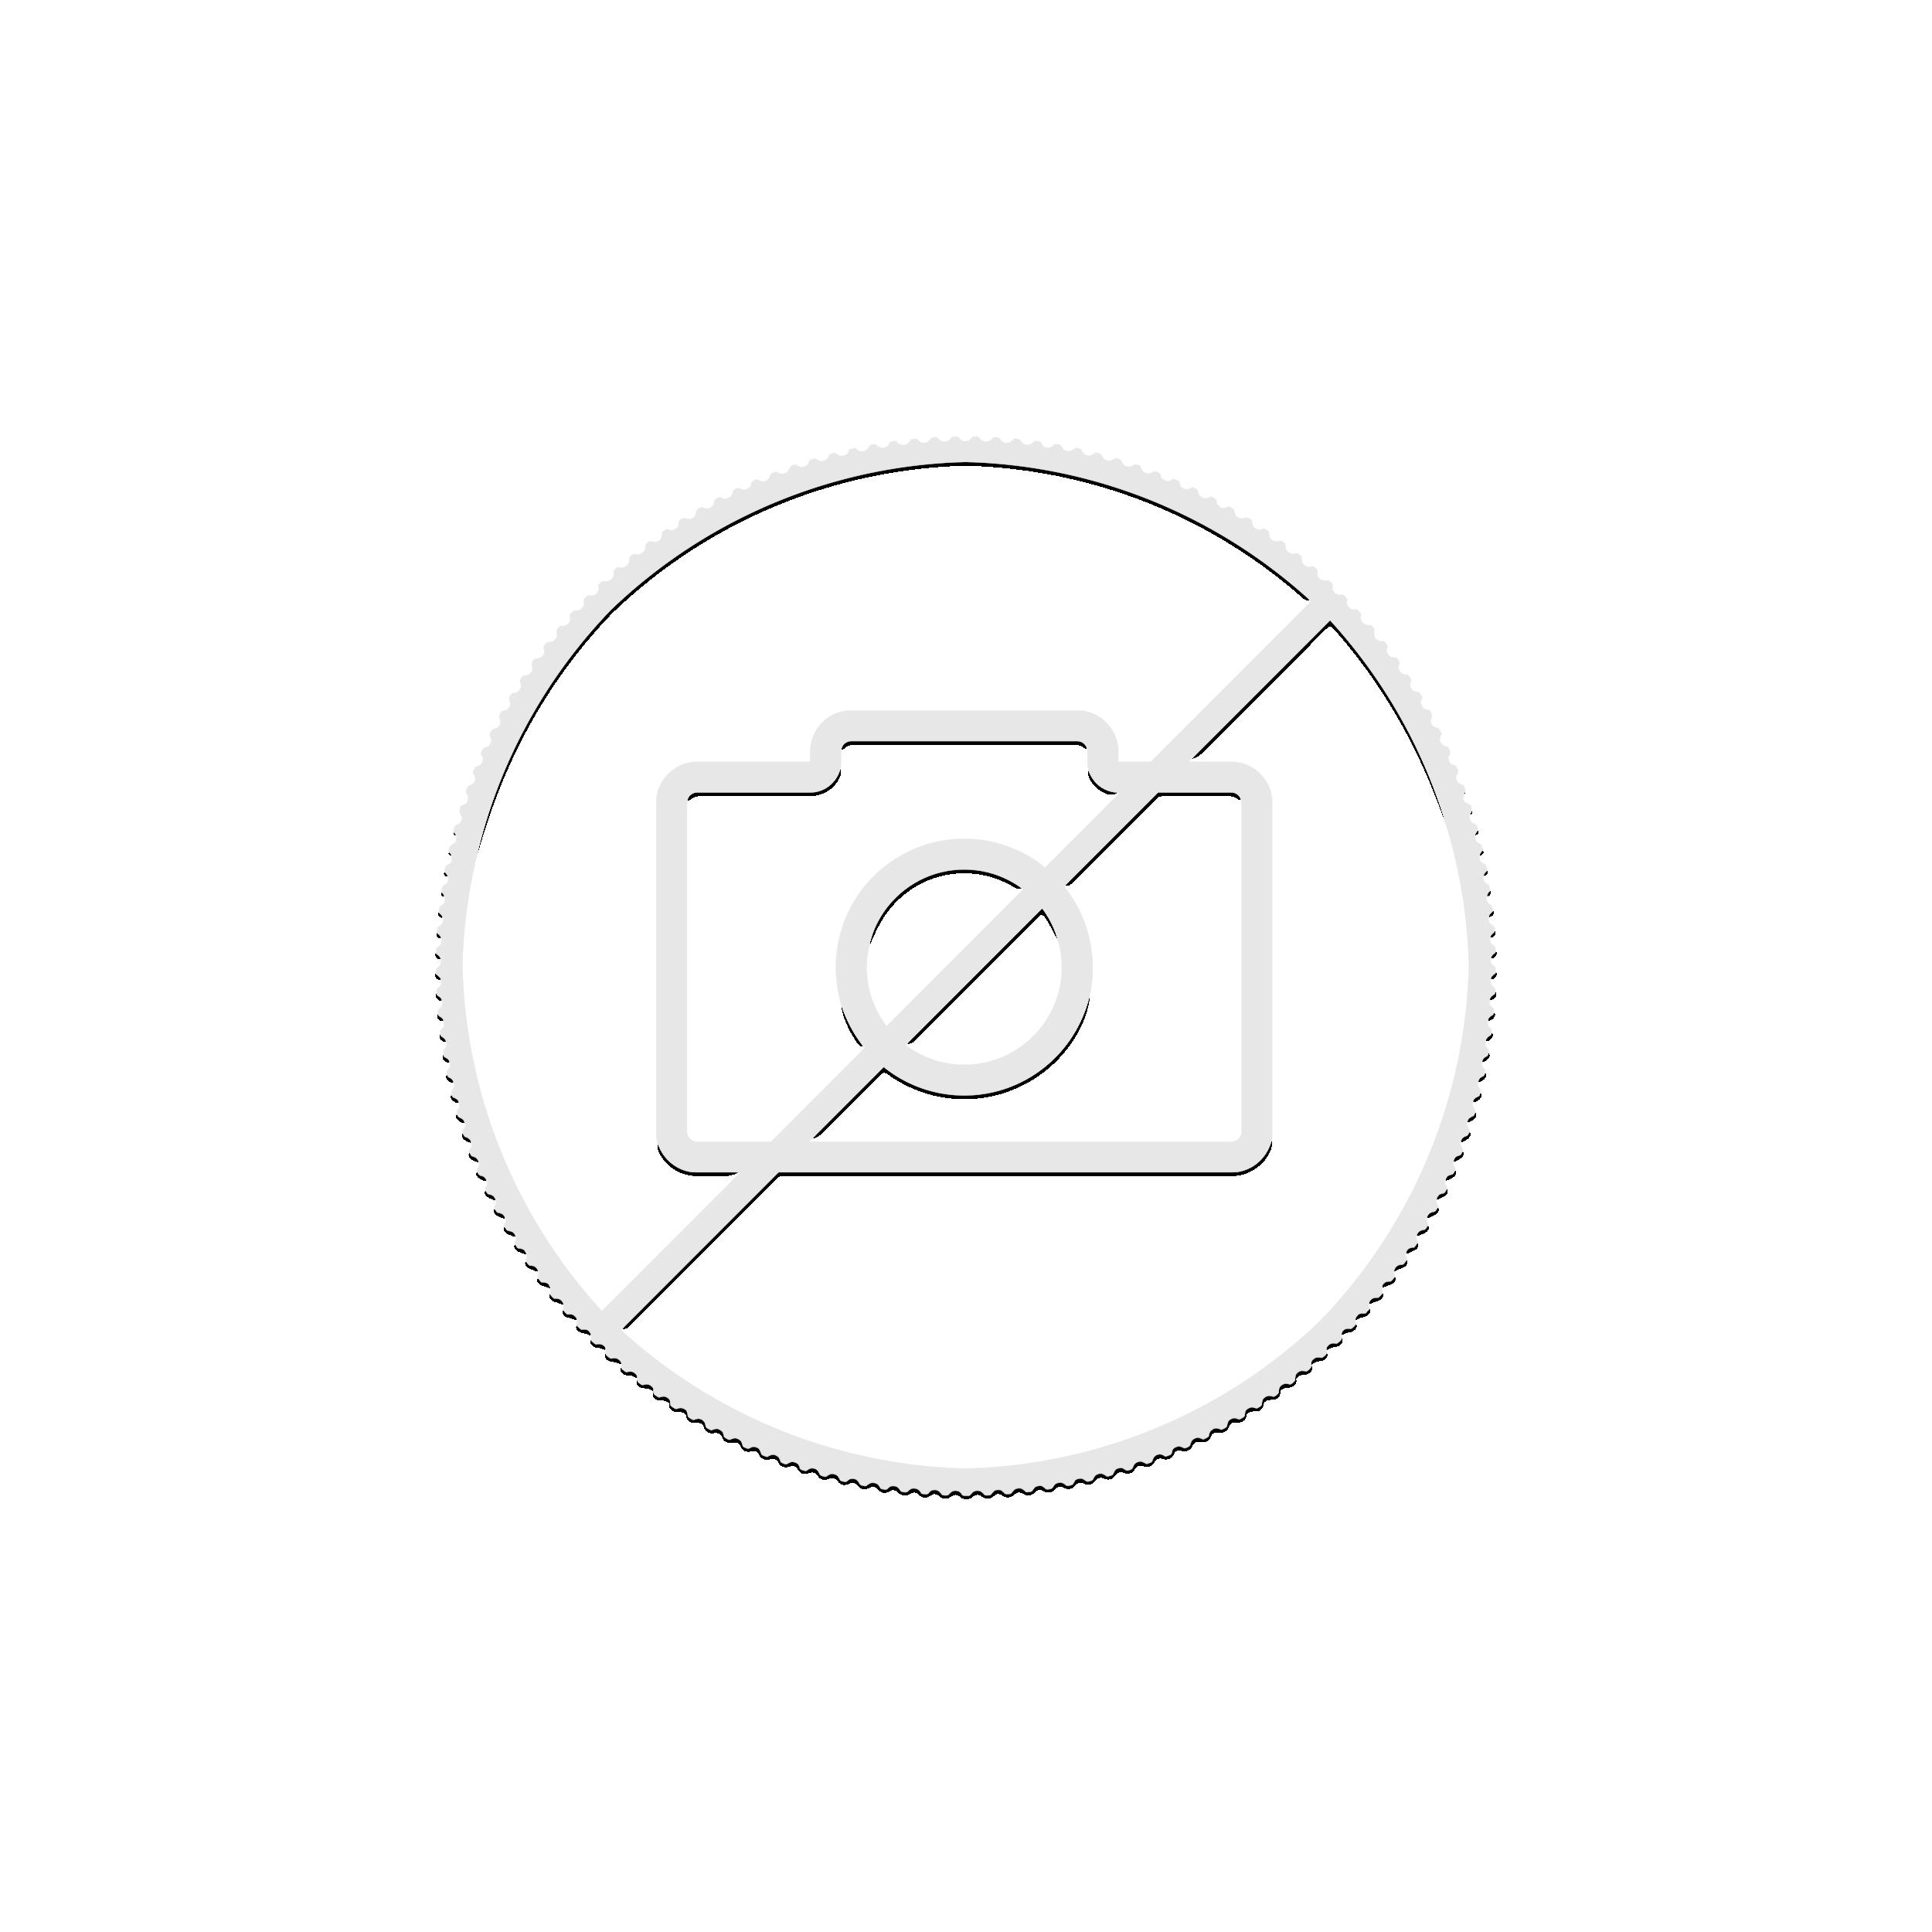 1 Troy ounce silver coin Koala 2011